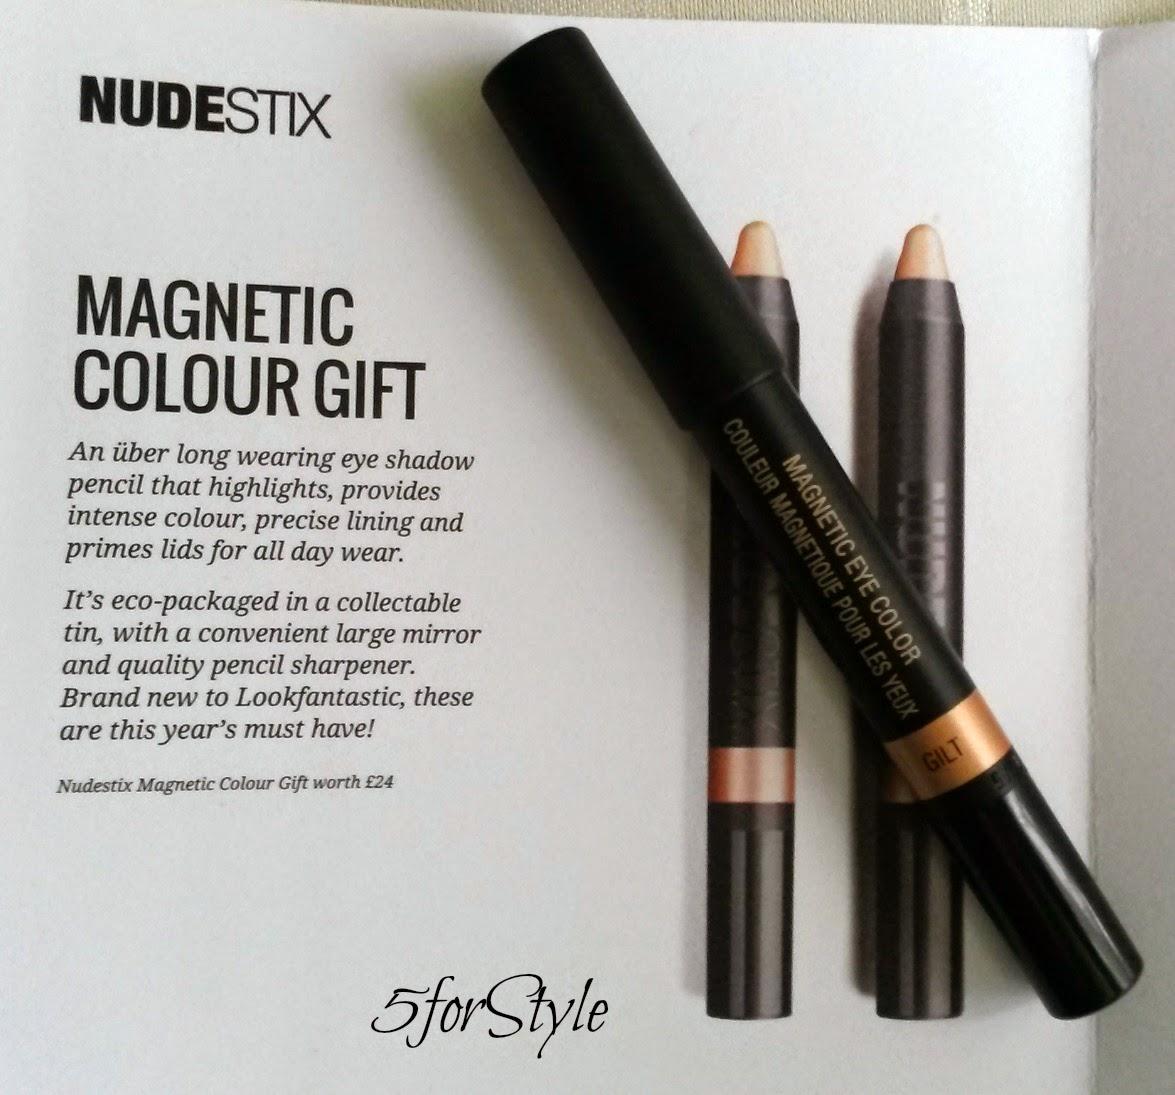 Nudestix Magnetic Colour Gift, Gilt